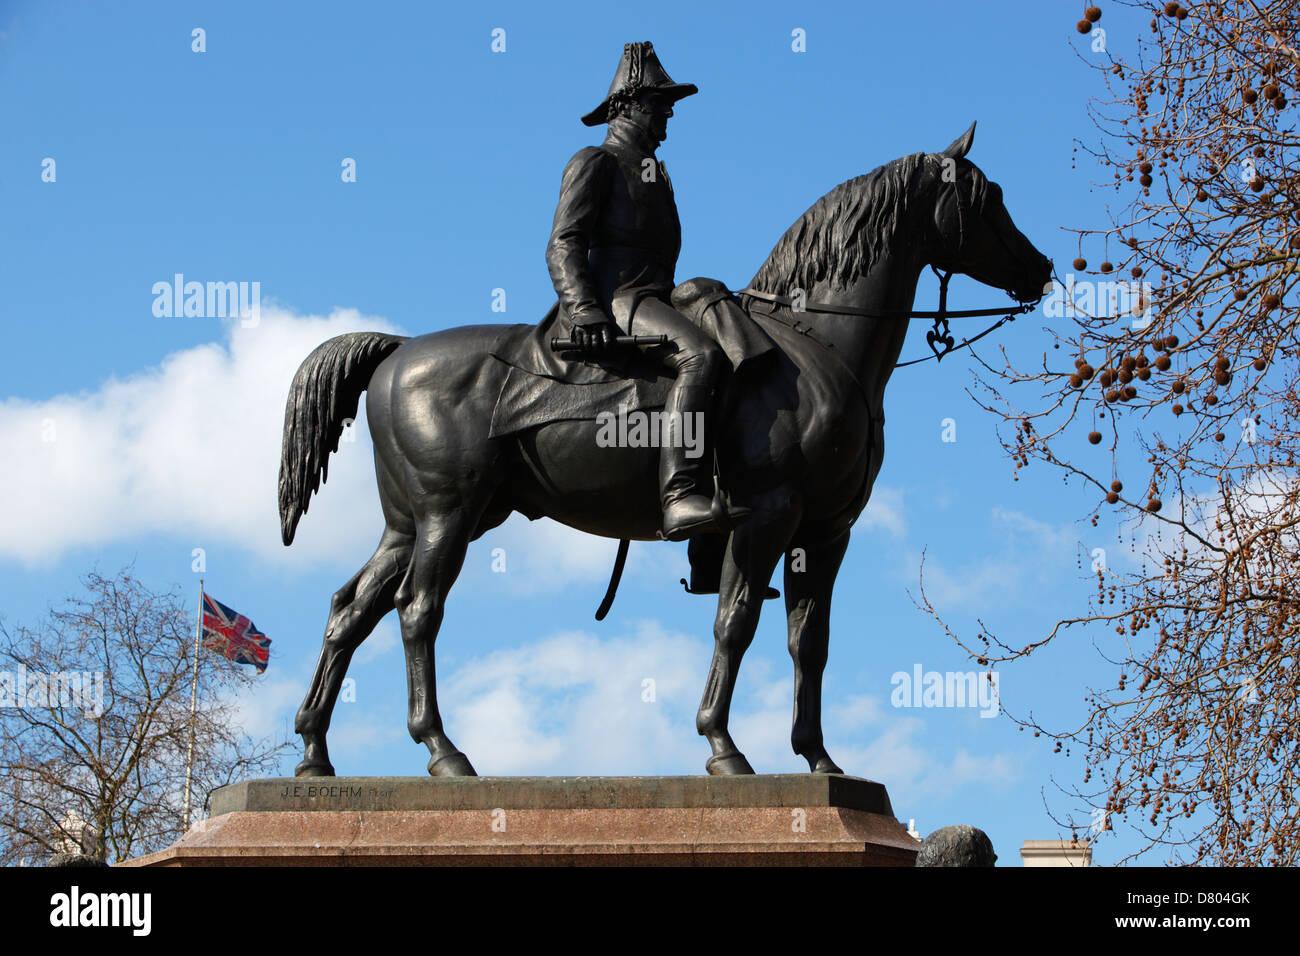 Equestrian statue of the 1st Duke of Wellington on Hyde Park Corner - Stock Image